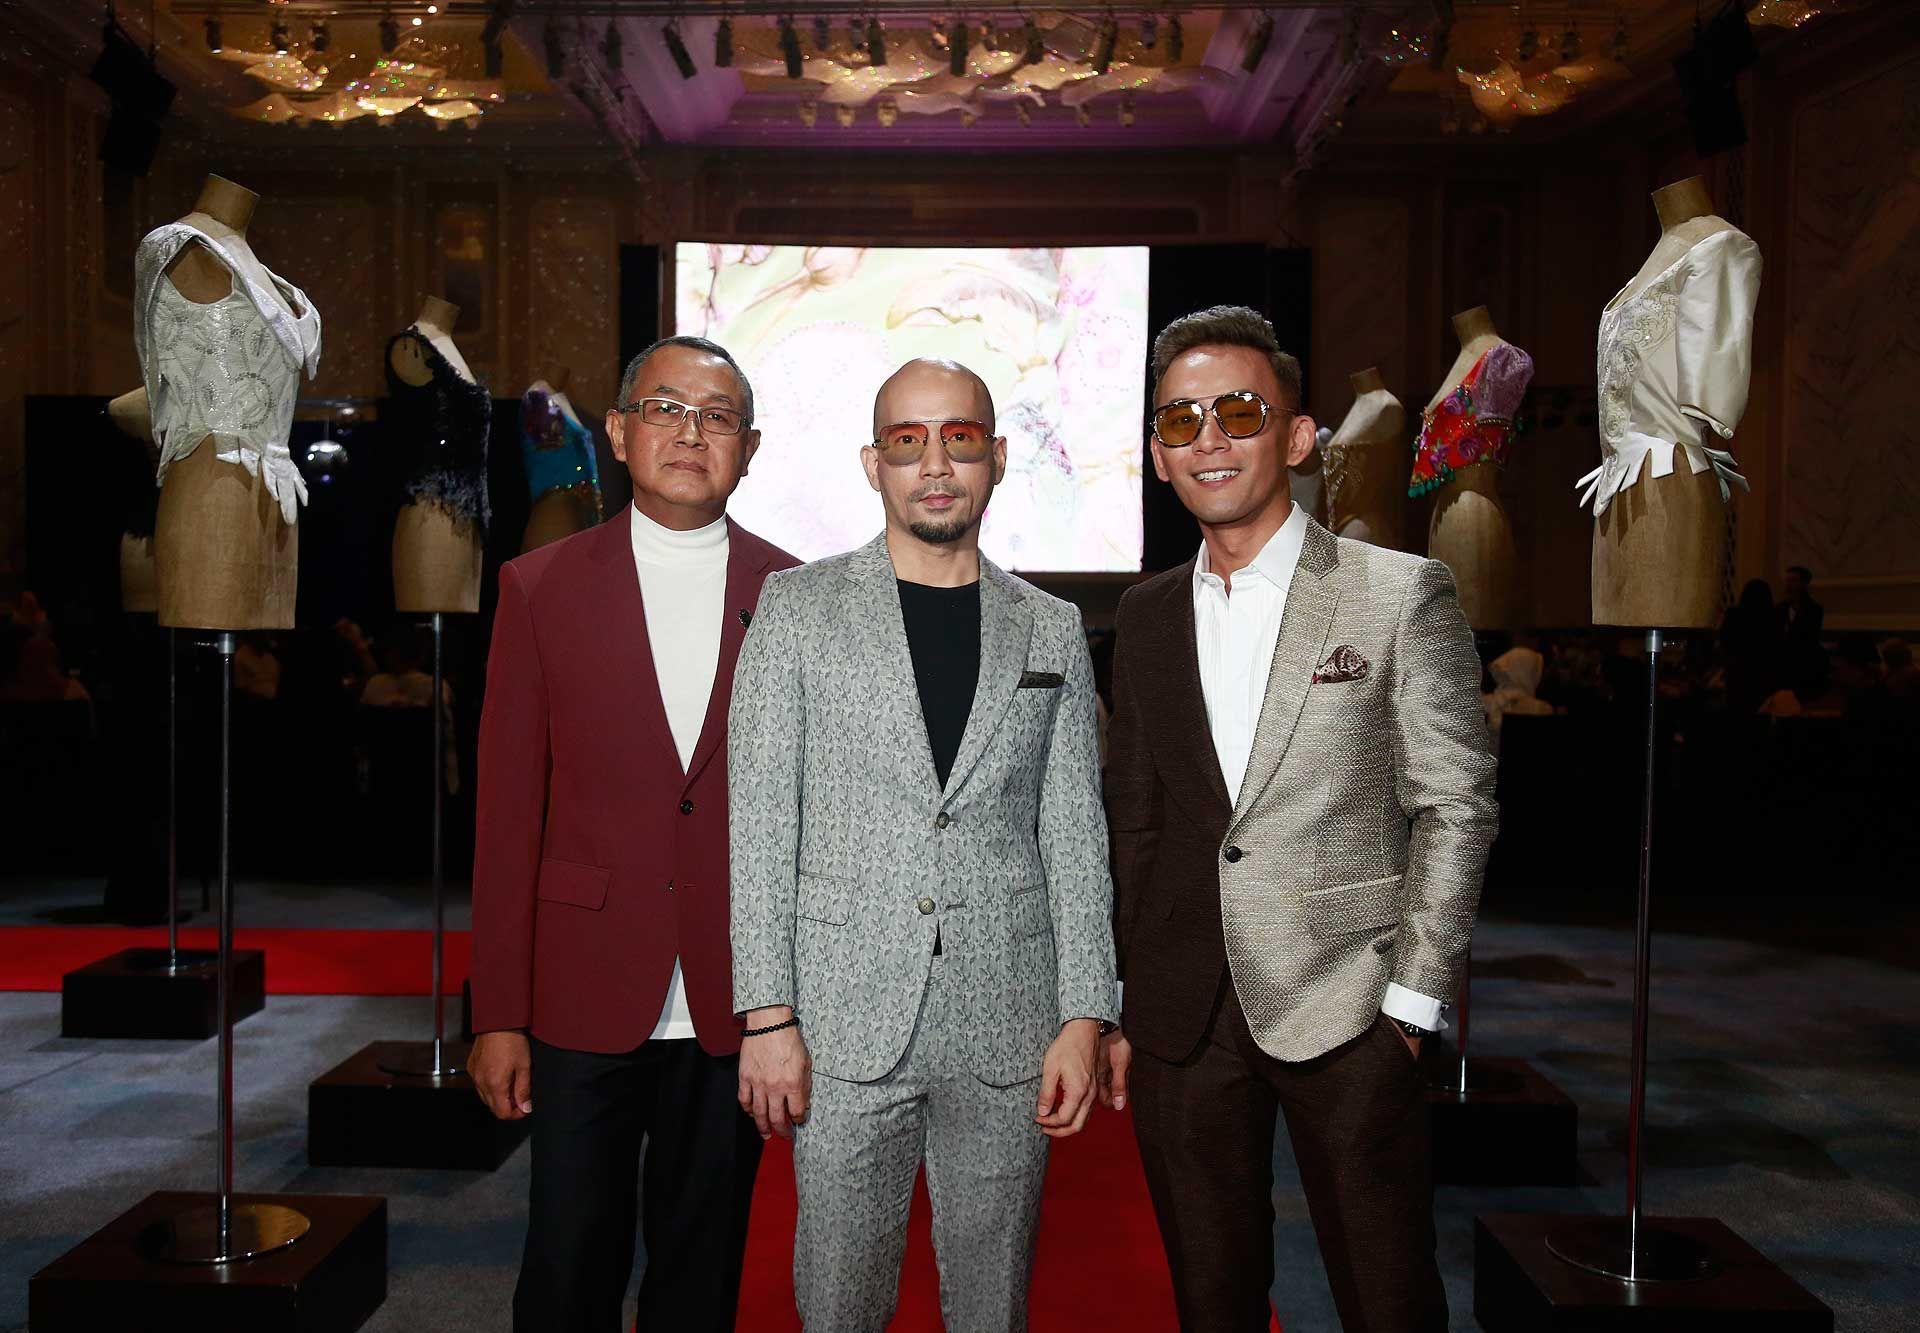 Raja Idnar, Zamry Saffian and Andre Amir